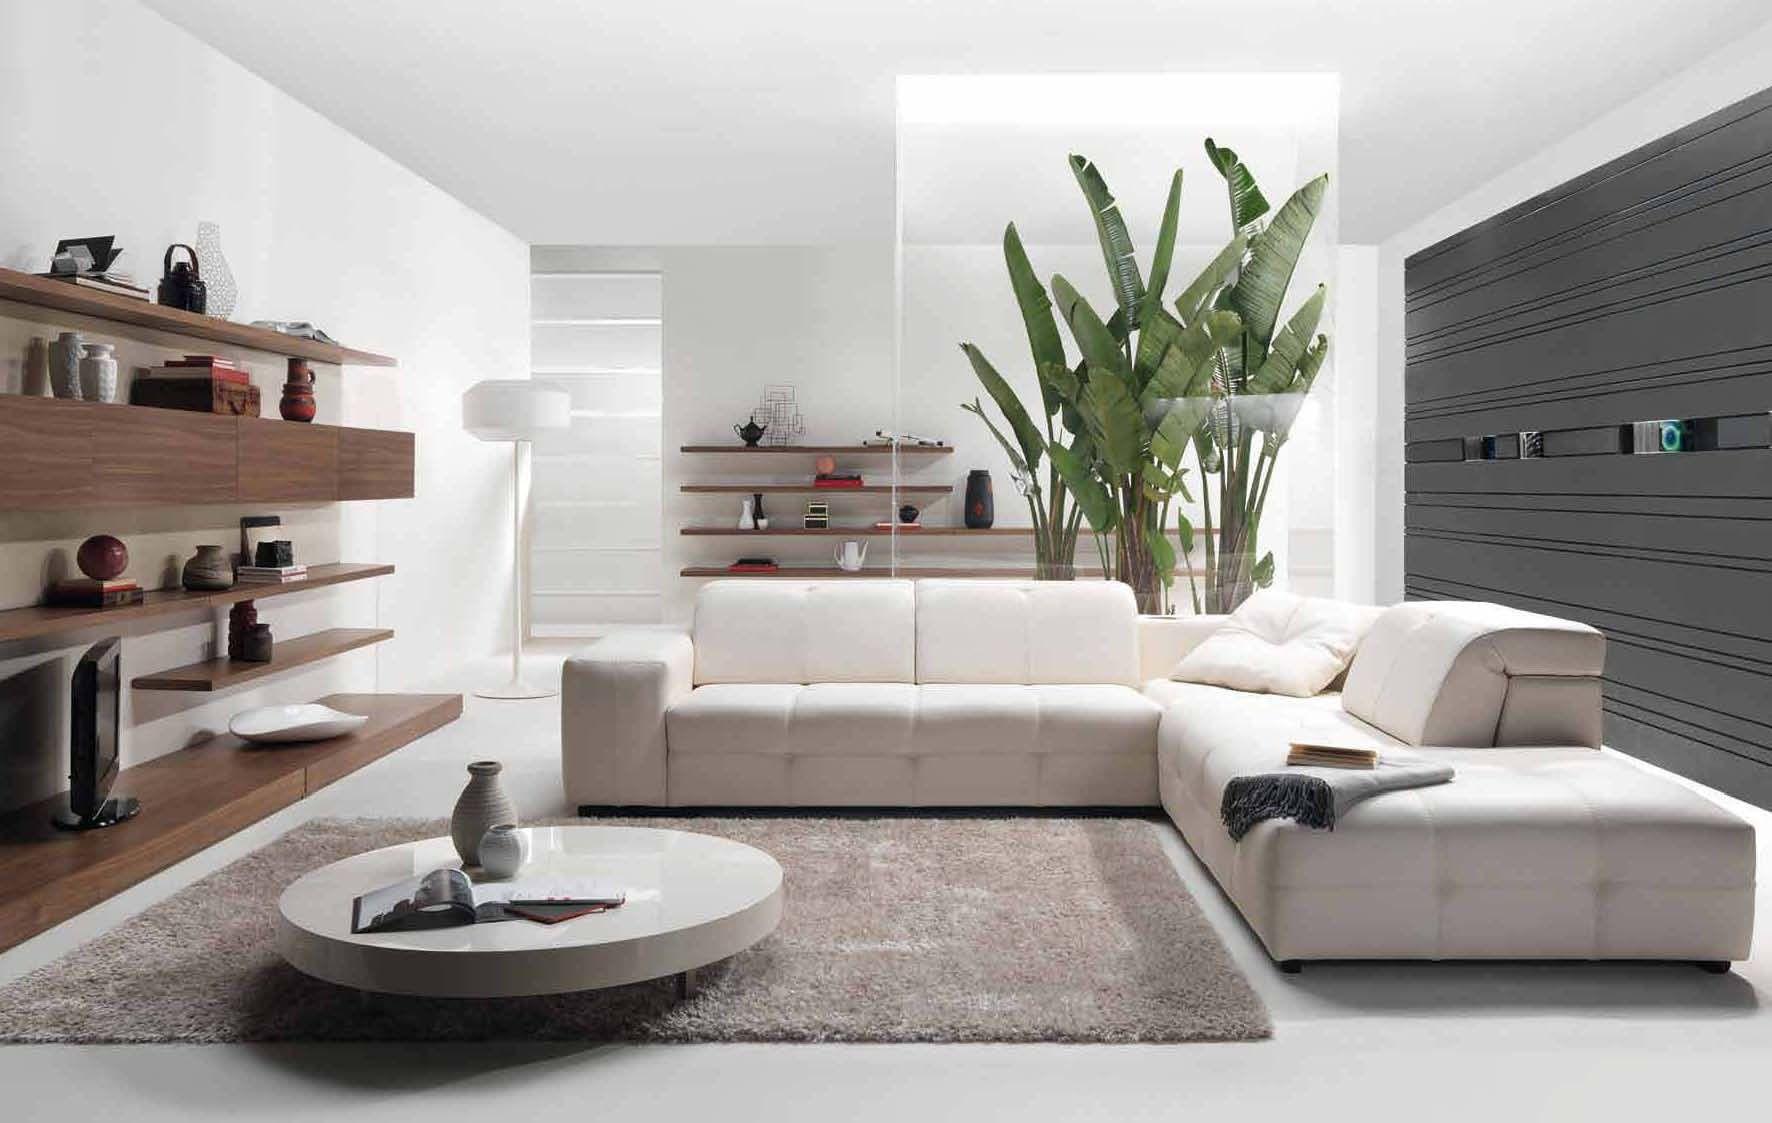 Living Room Modern Living Room Interior Design luxury living rooms and room interior on pinterest